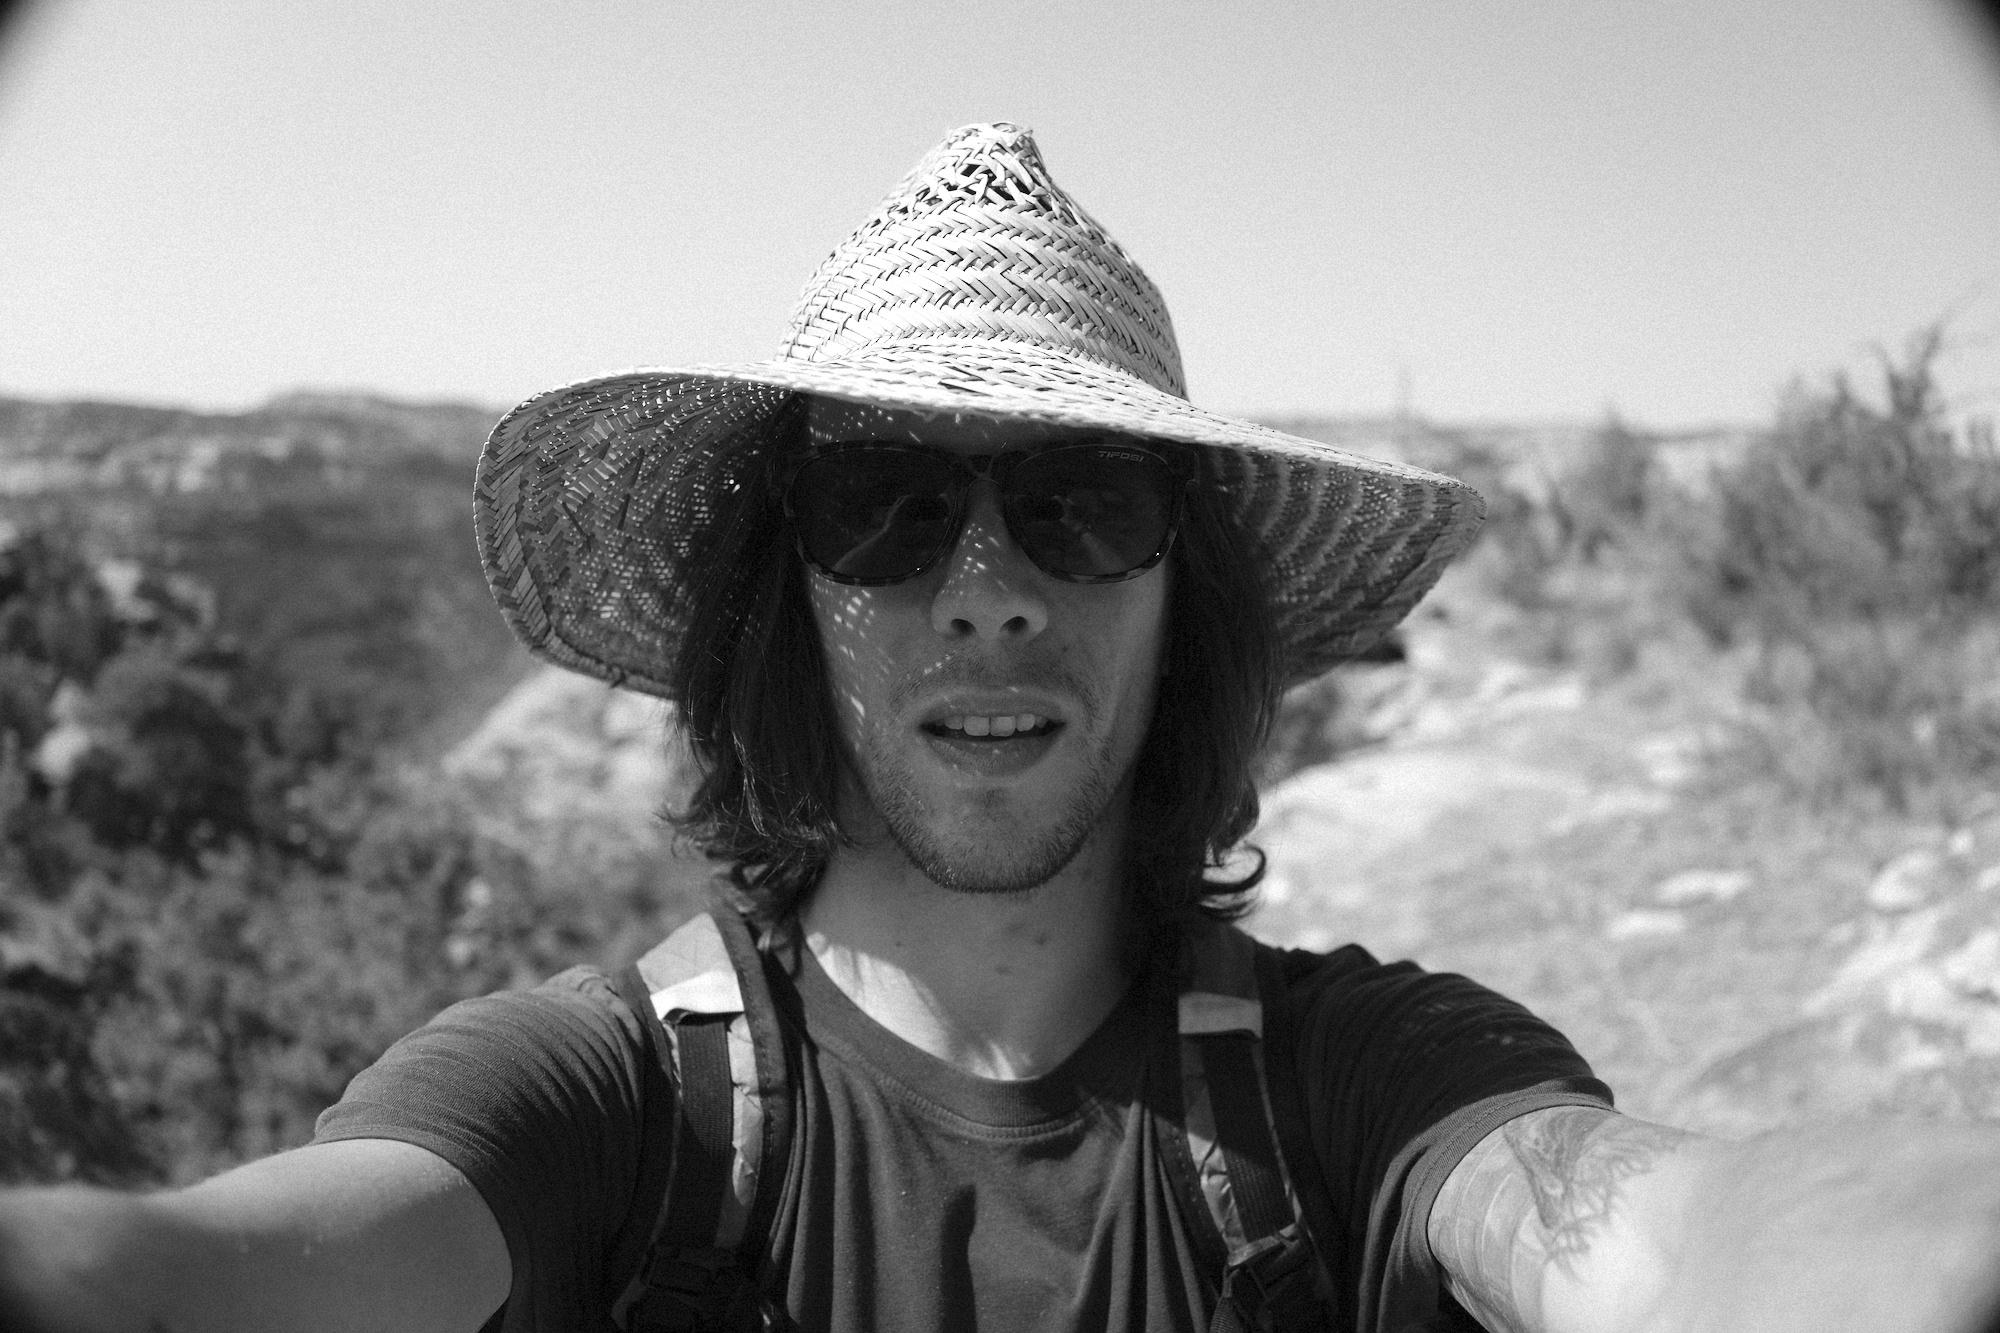 Colorado, self portrait, hiking, b&w